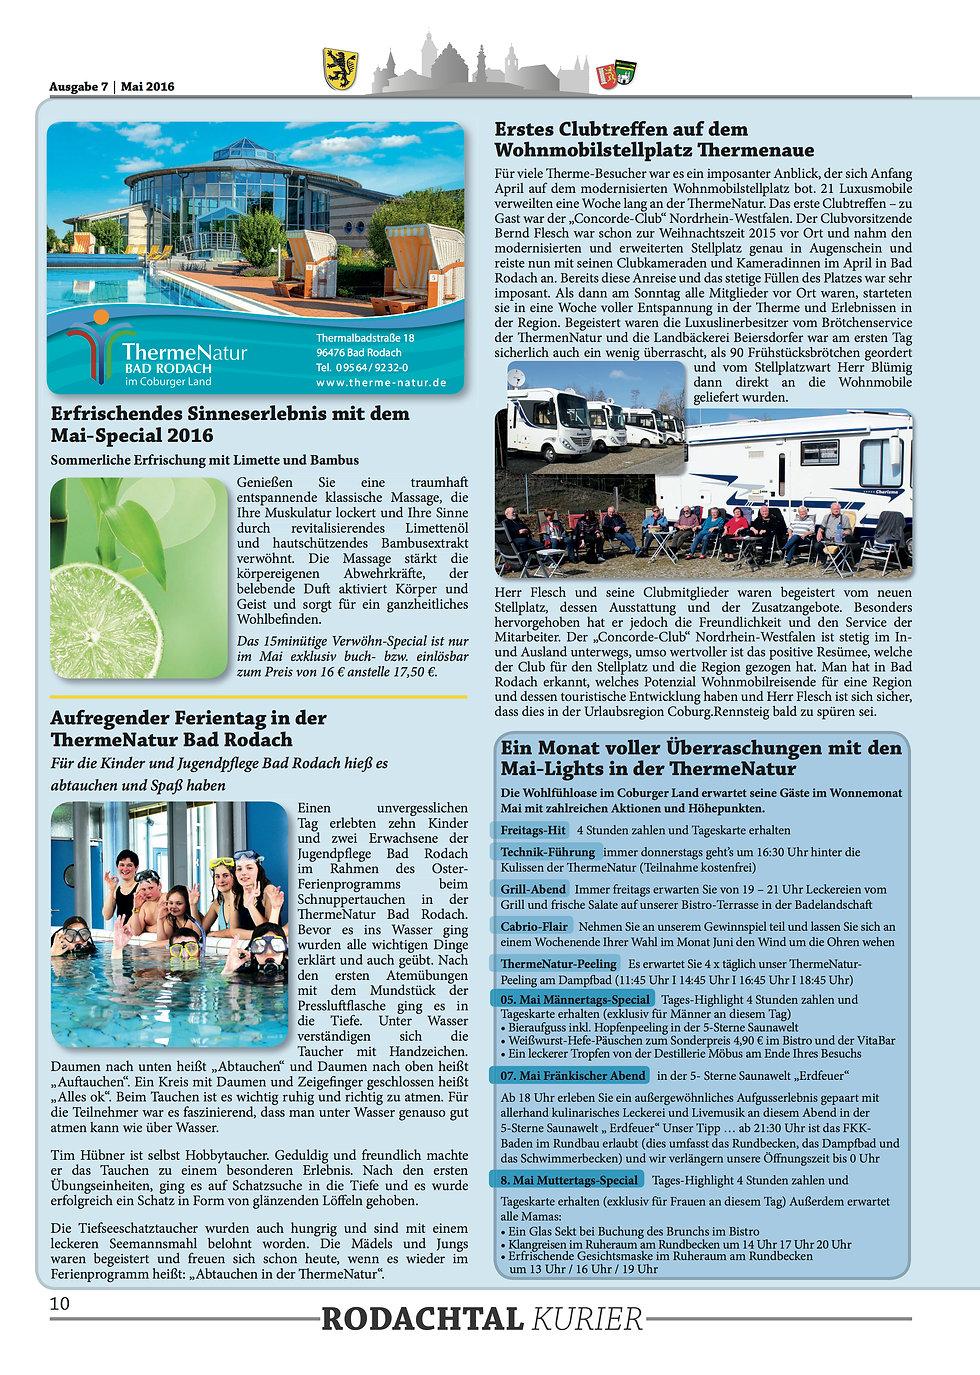 Therme Natur Bad Rodach Aktionen im Mai